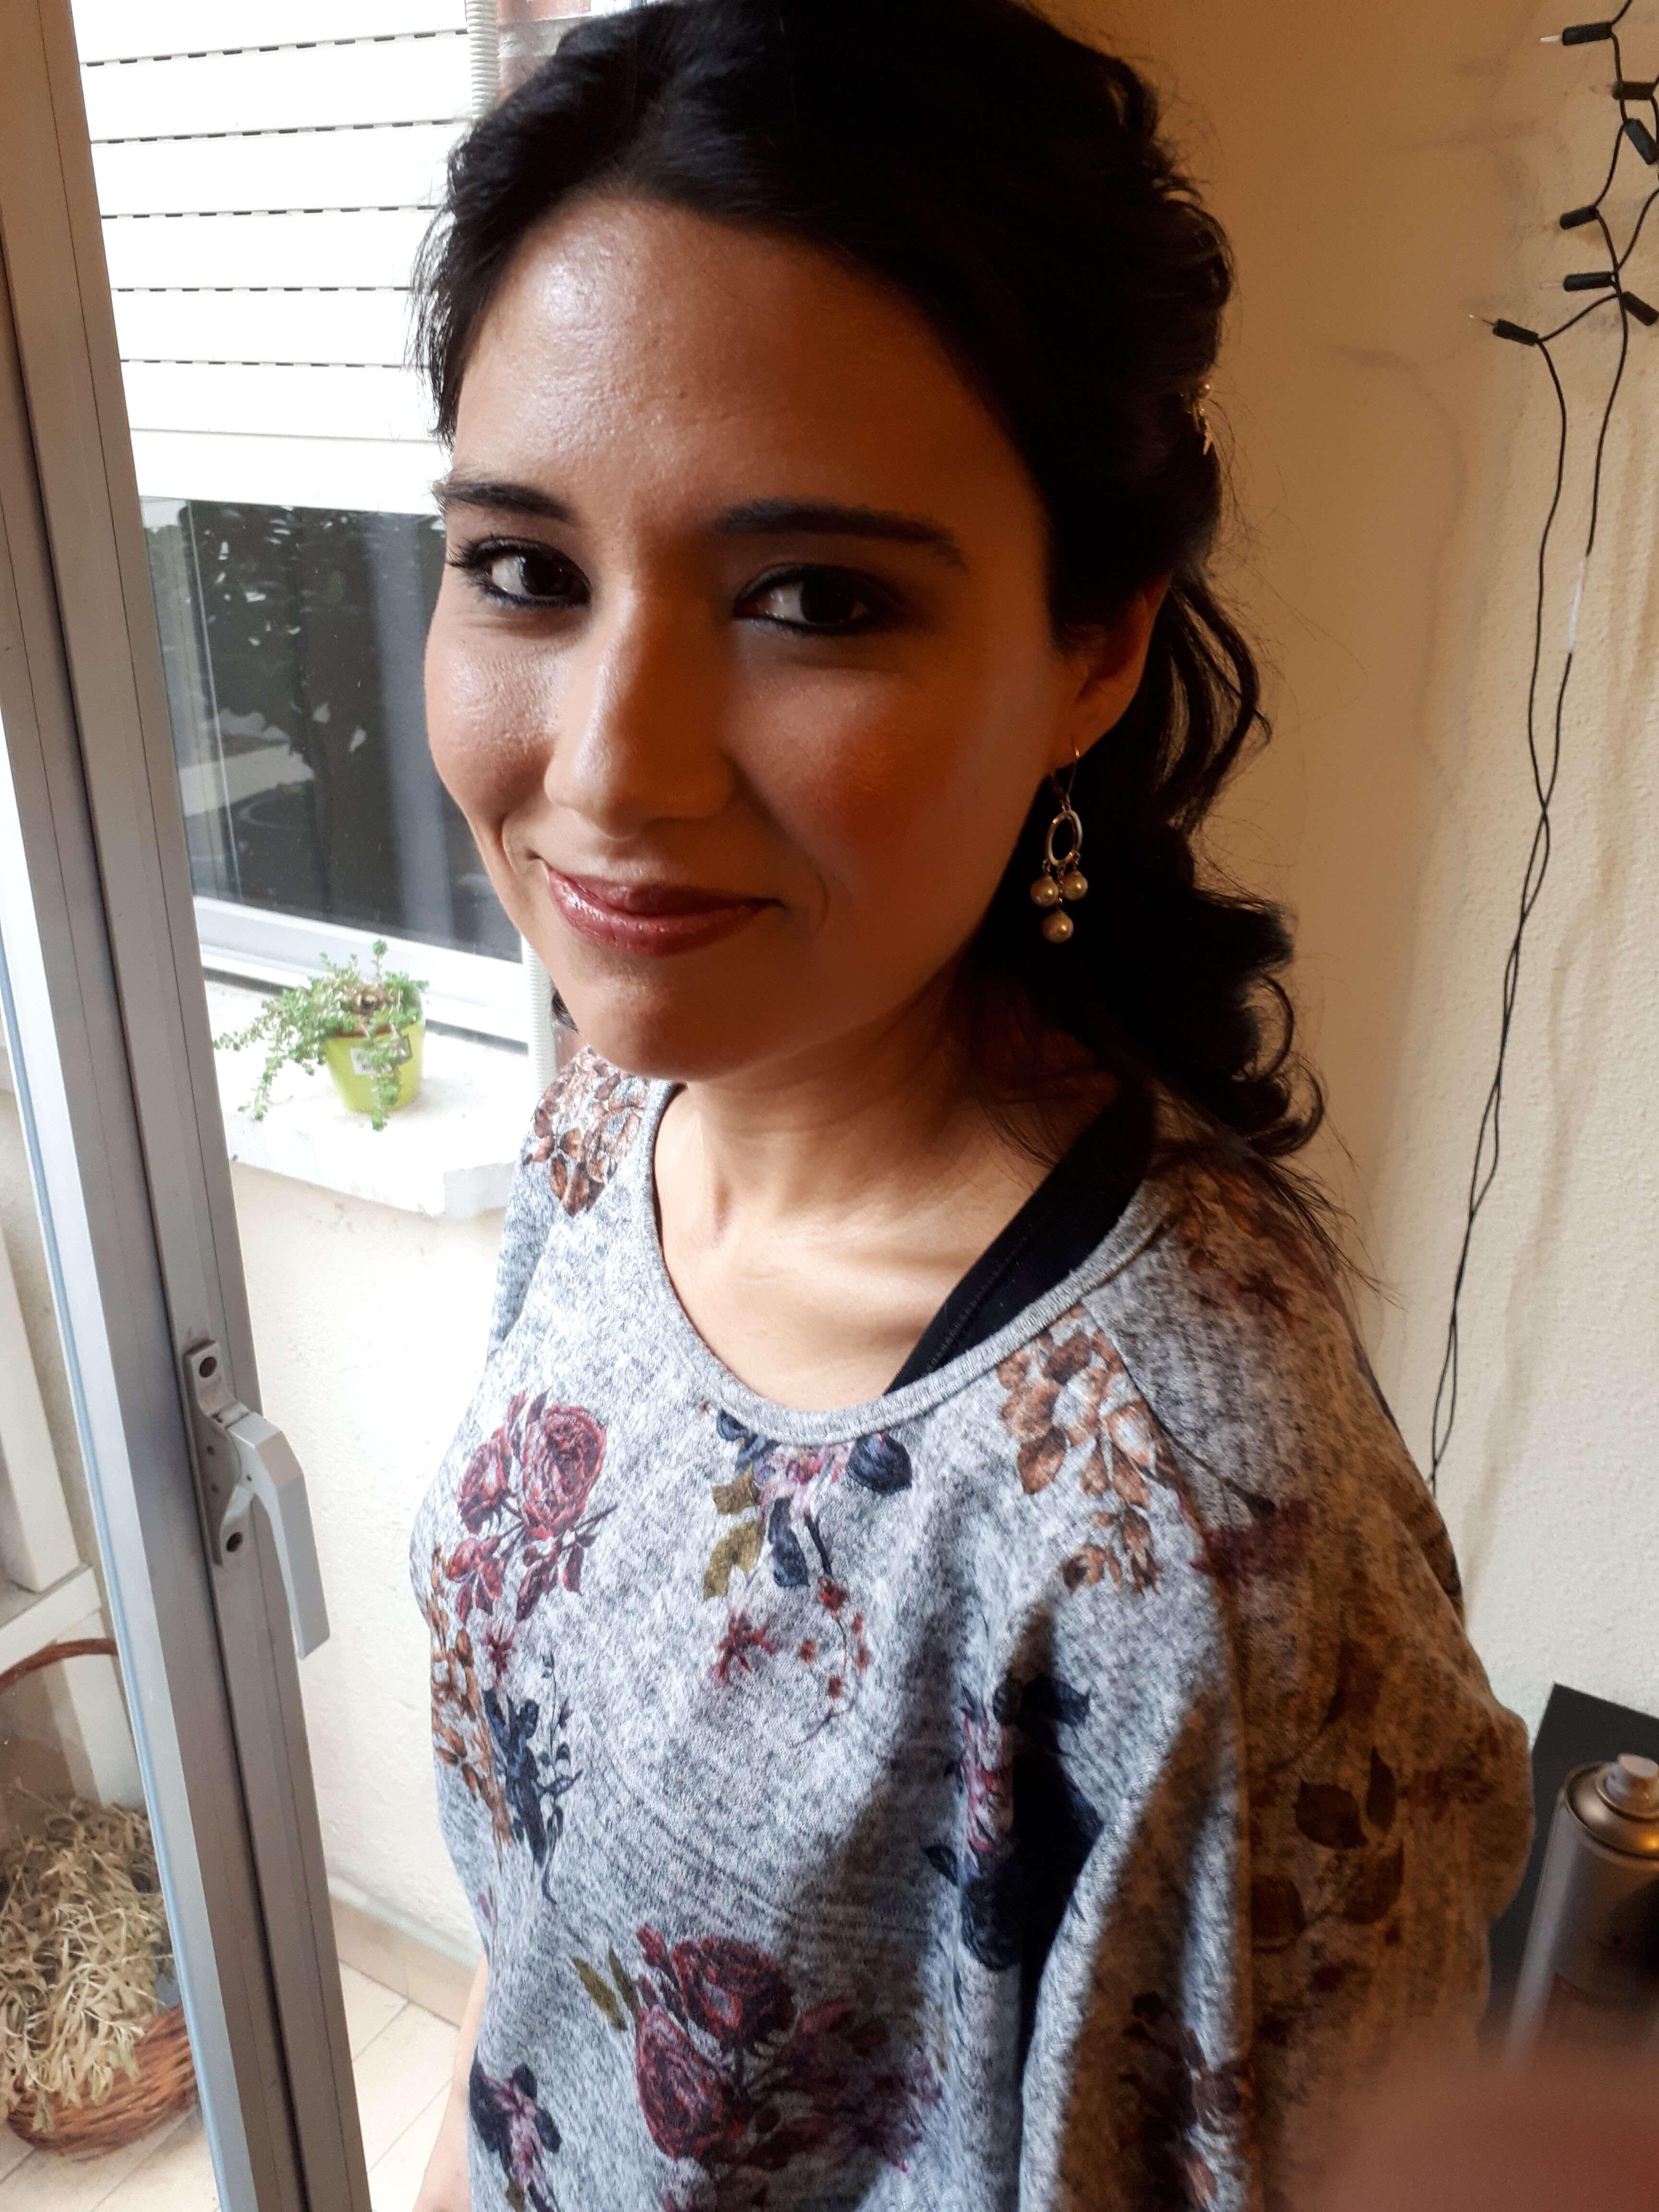 prueba-maquillaje-peinado-novia-media-melena-3